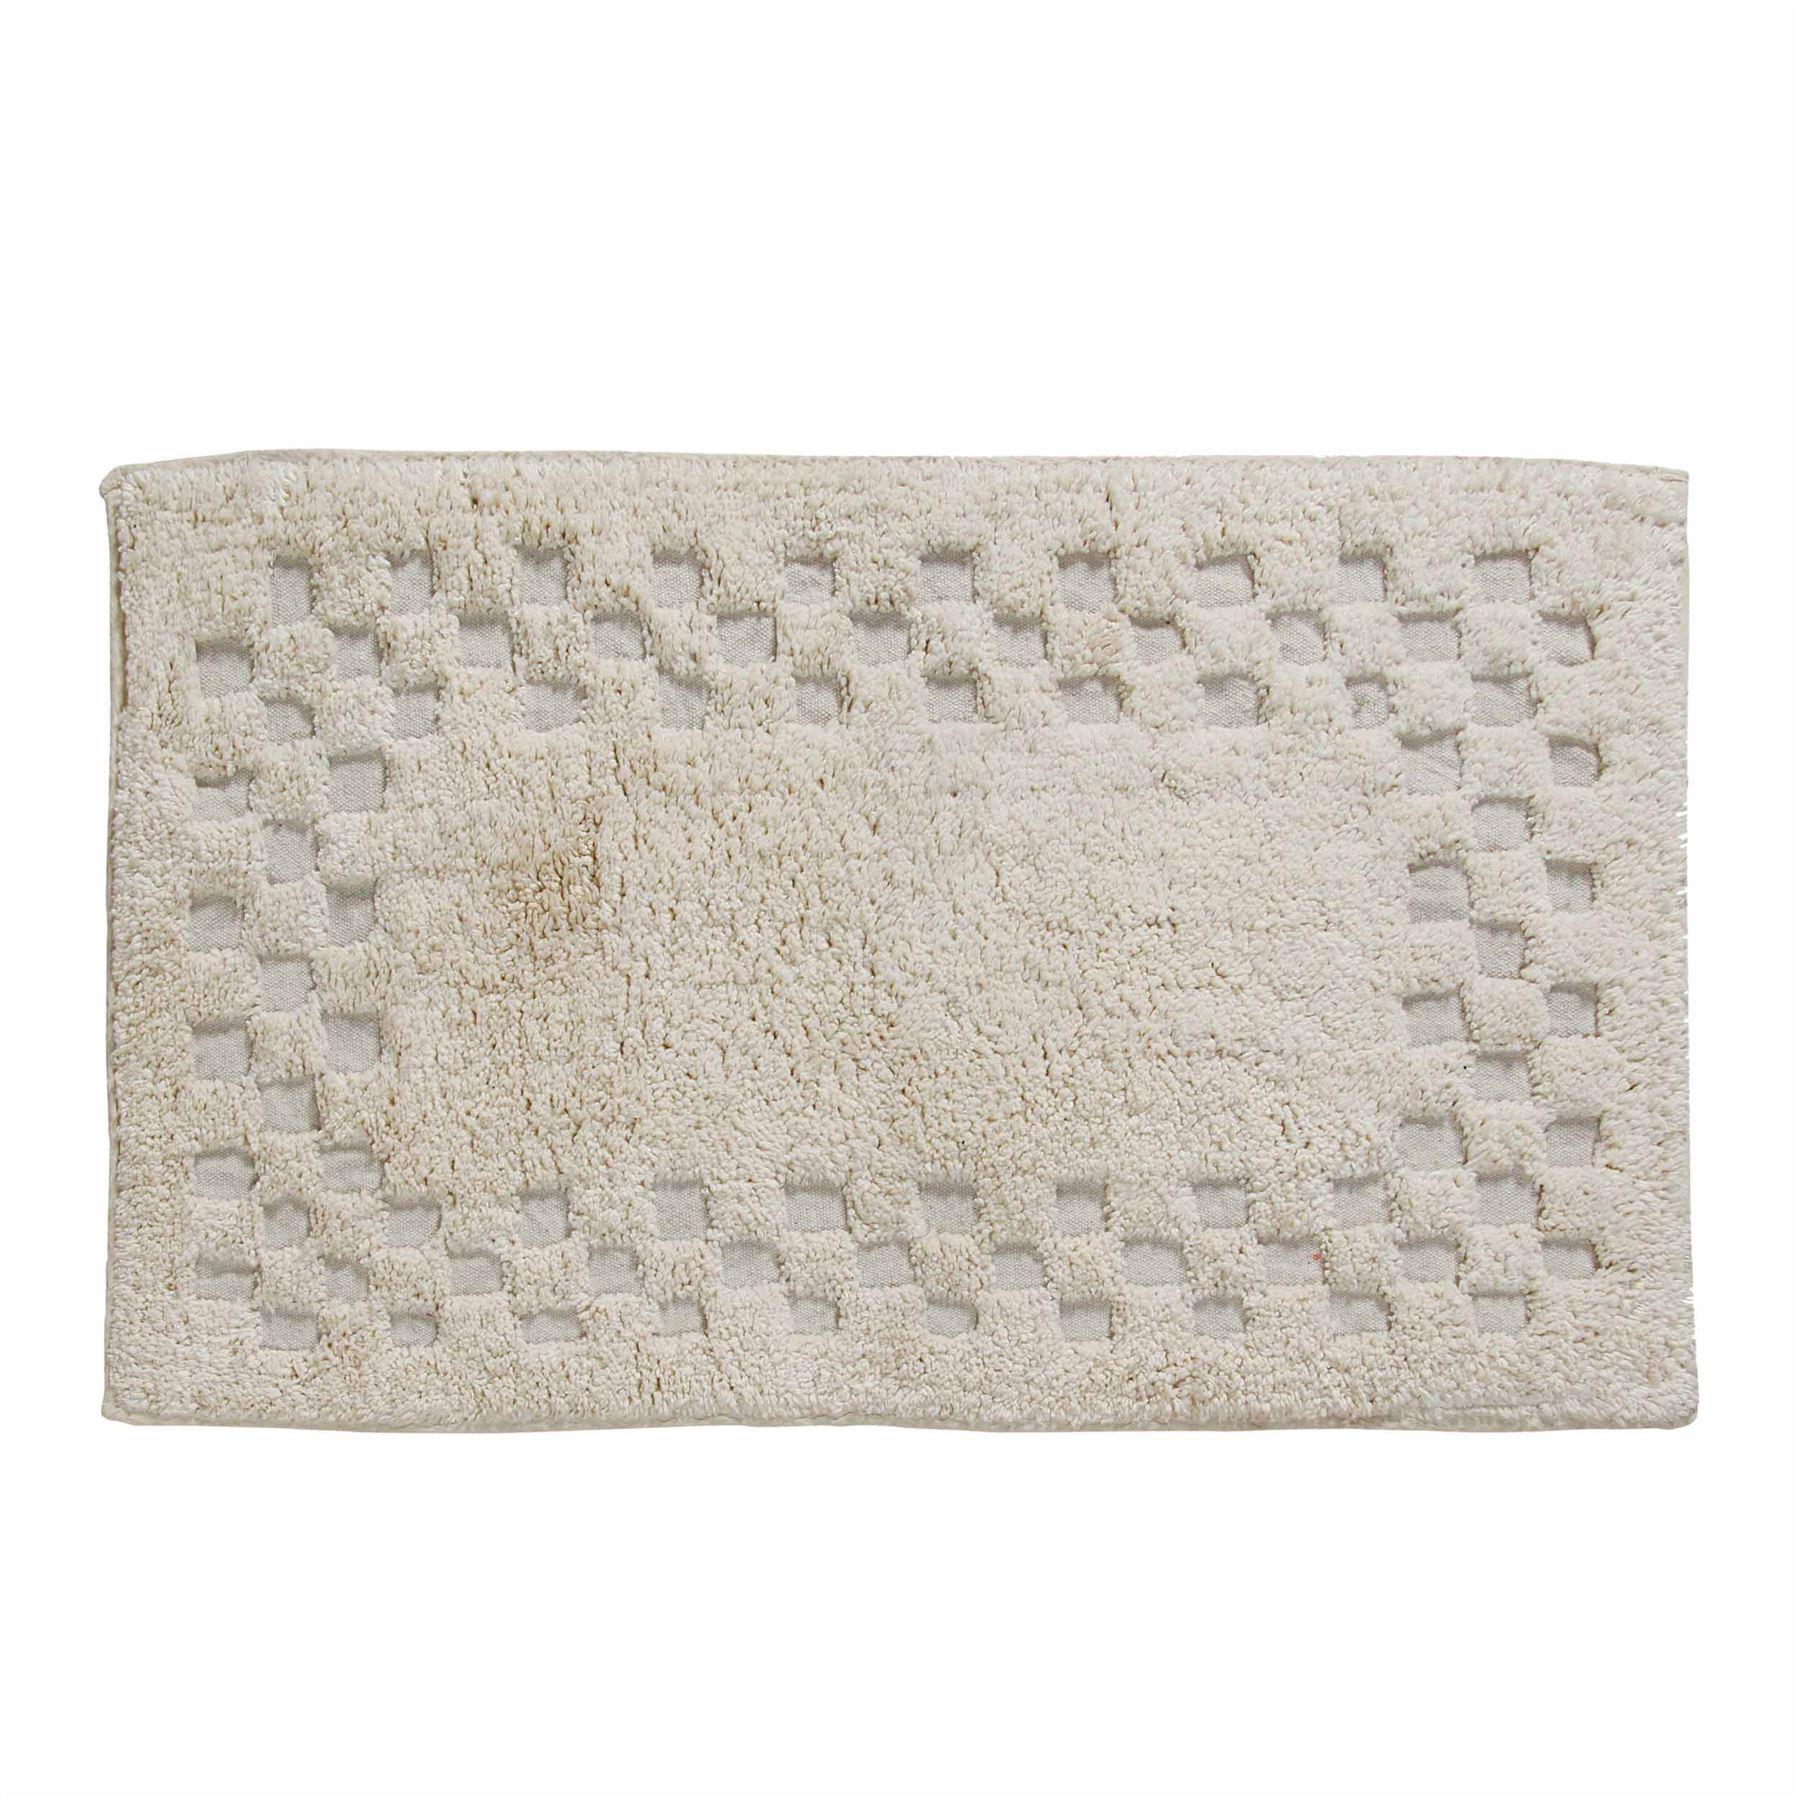 Shower Mats Bath Amp Pedestal Set Non Slip Soft 100 Cotton